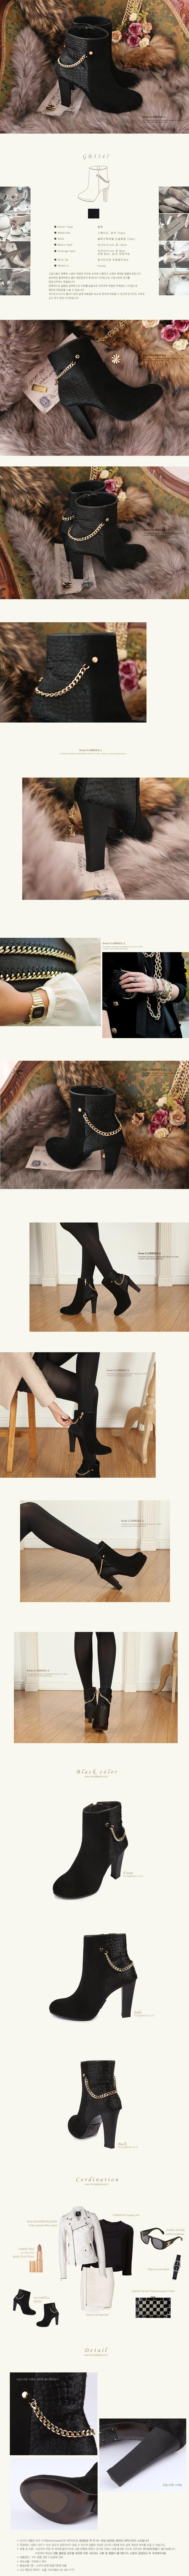 Boots Nữ Thiết Kế  10cm - GB954